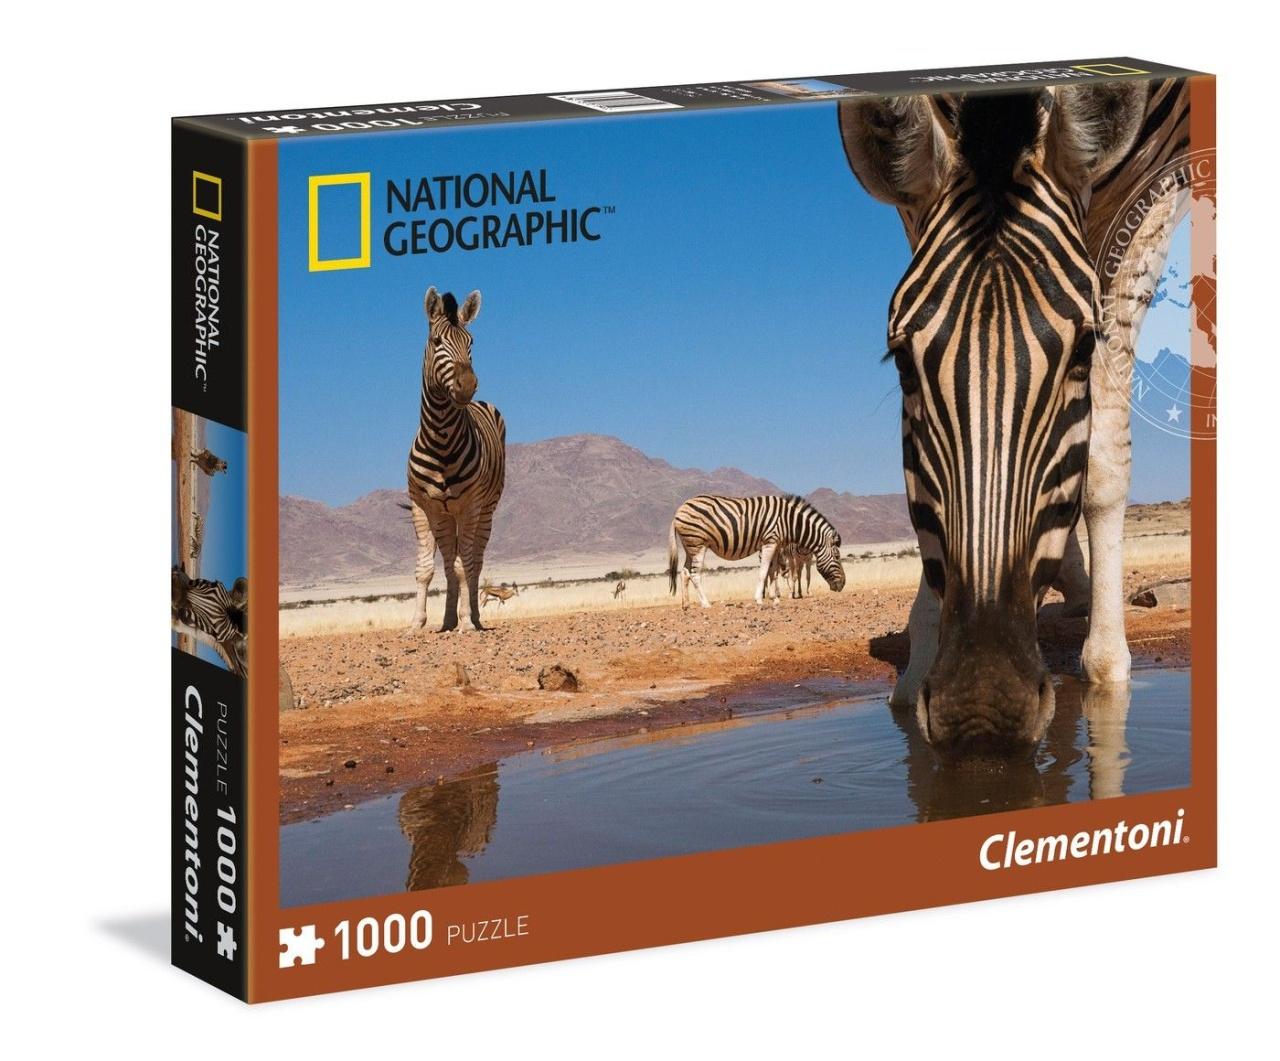 Clementoni National Geographic Puzzle 1000 Teile Zebra